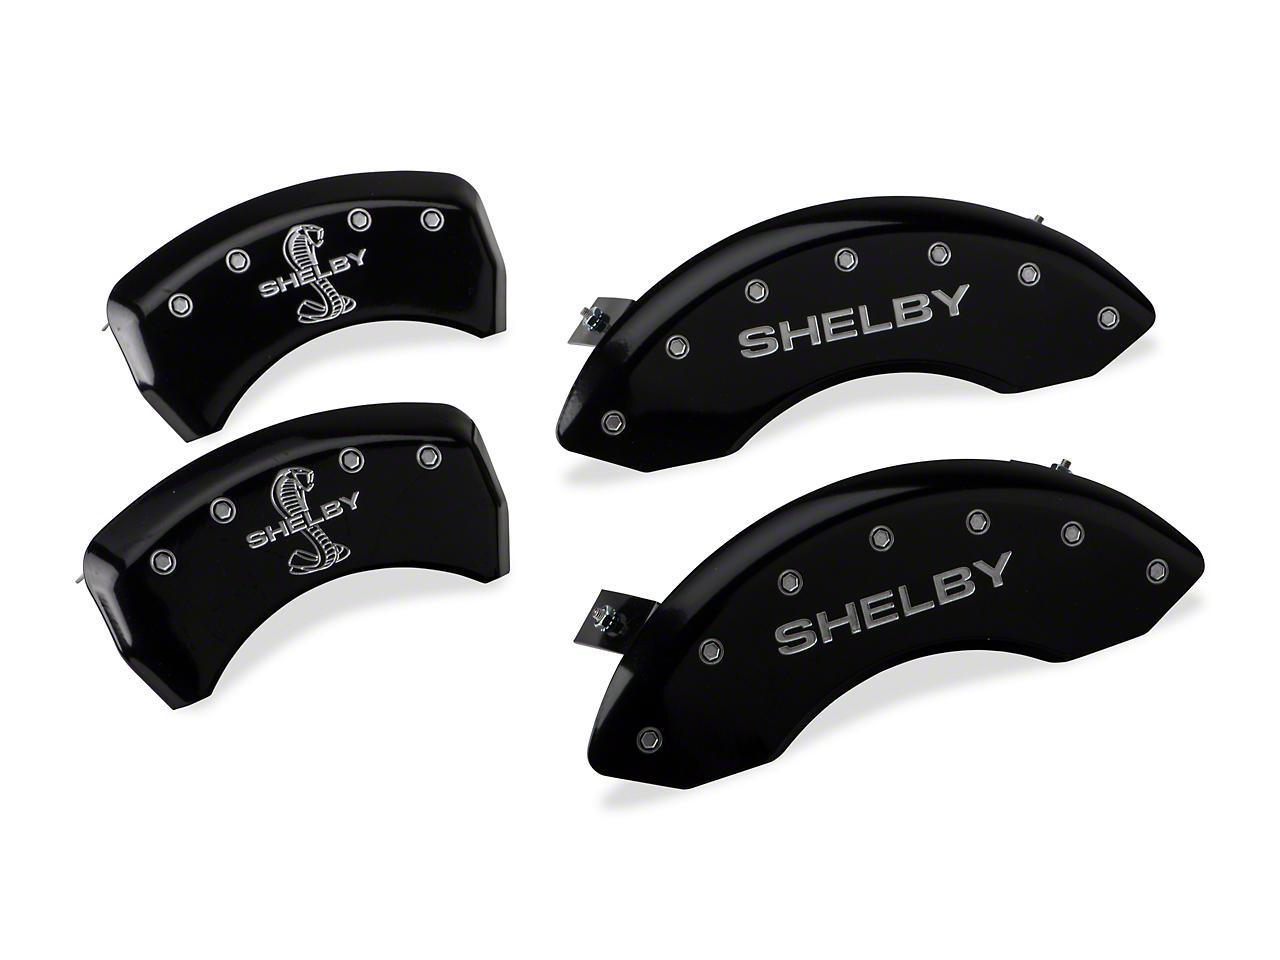 MGP Black Caliper Covers w/ Shelby Snake Logo - Front & Rear (05-10 GT, V6)